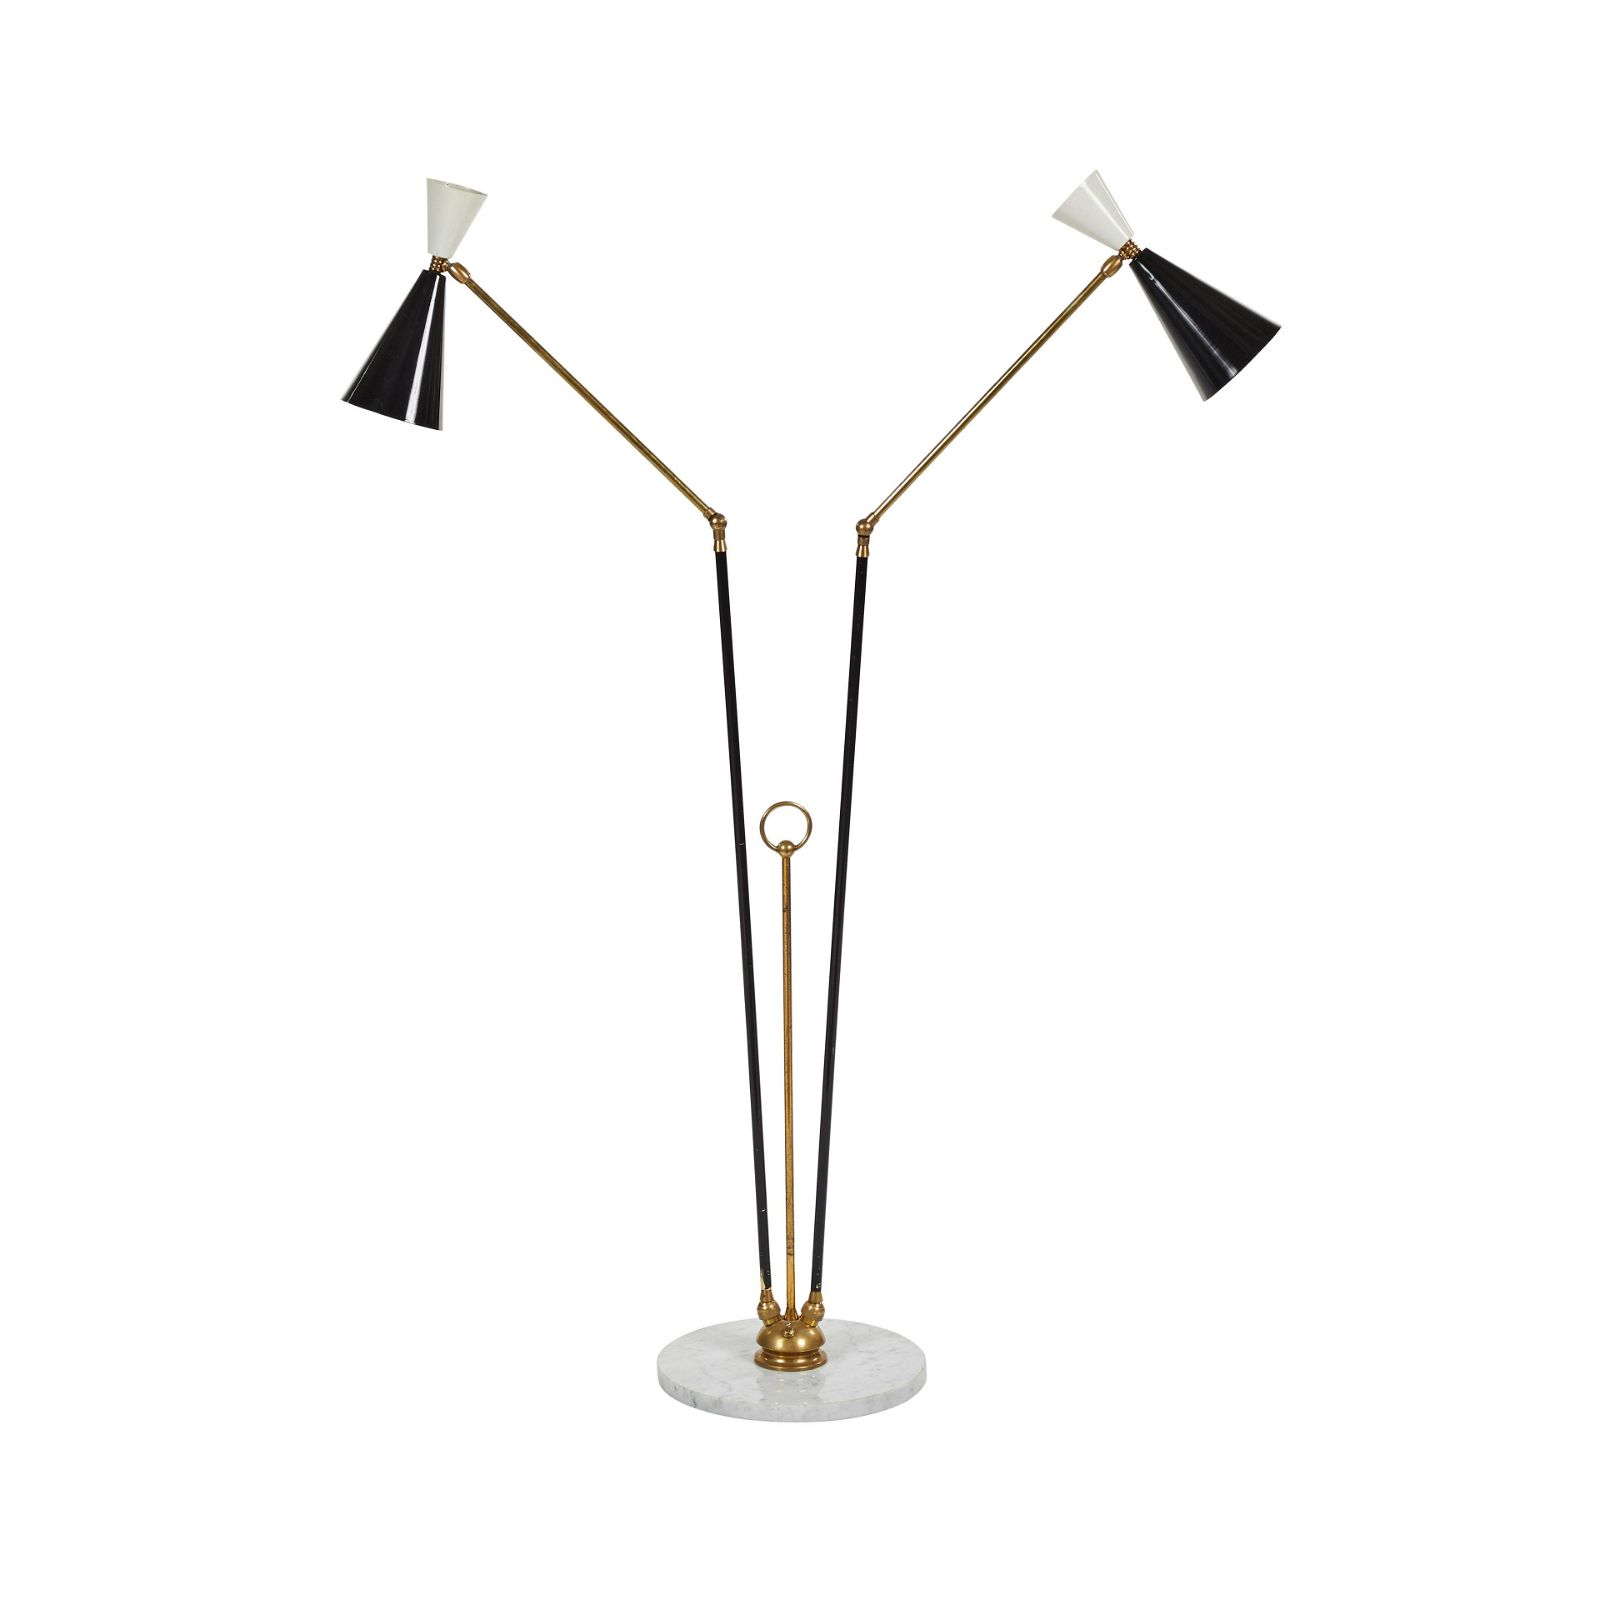 Italian Two-Arm Floor Lamp